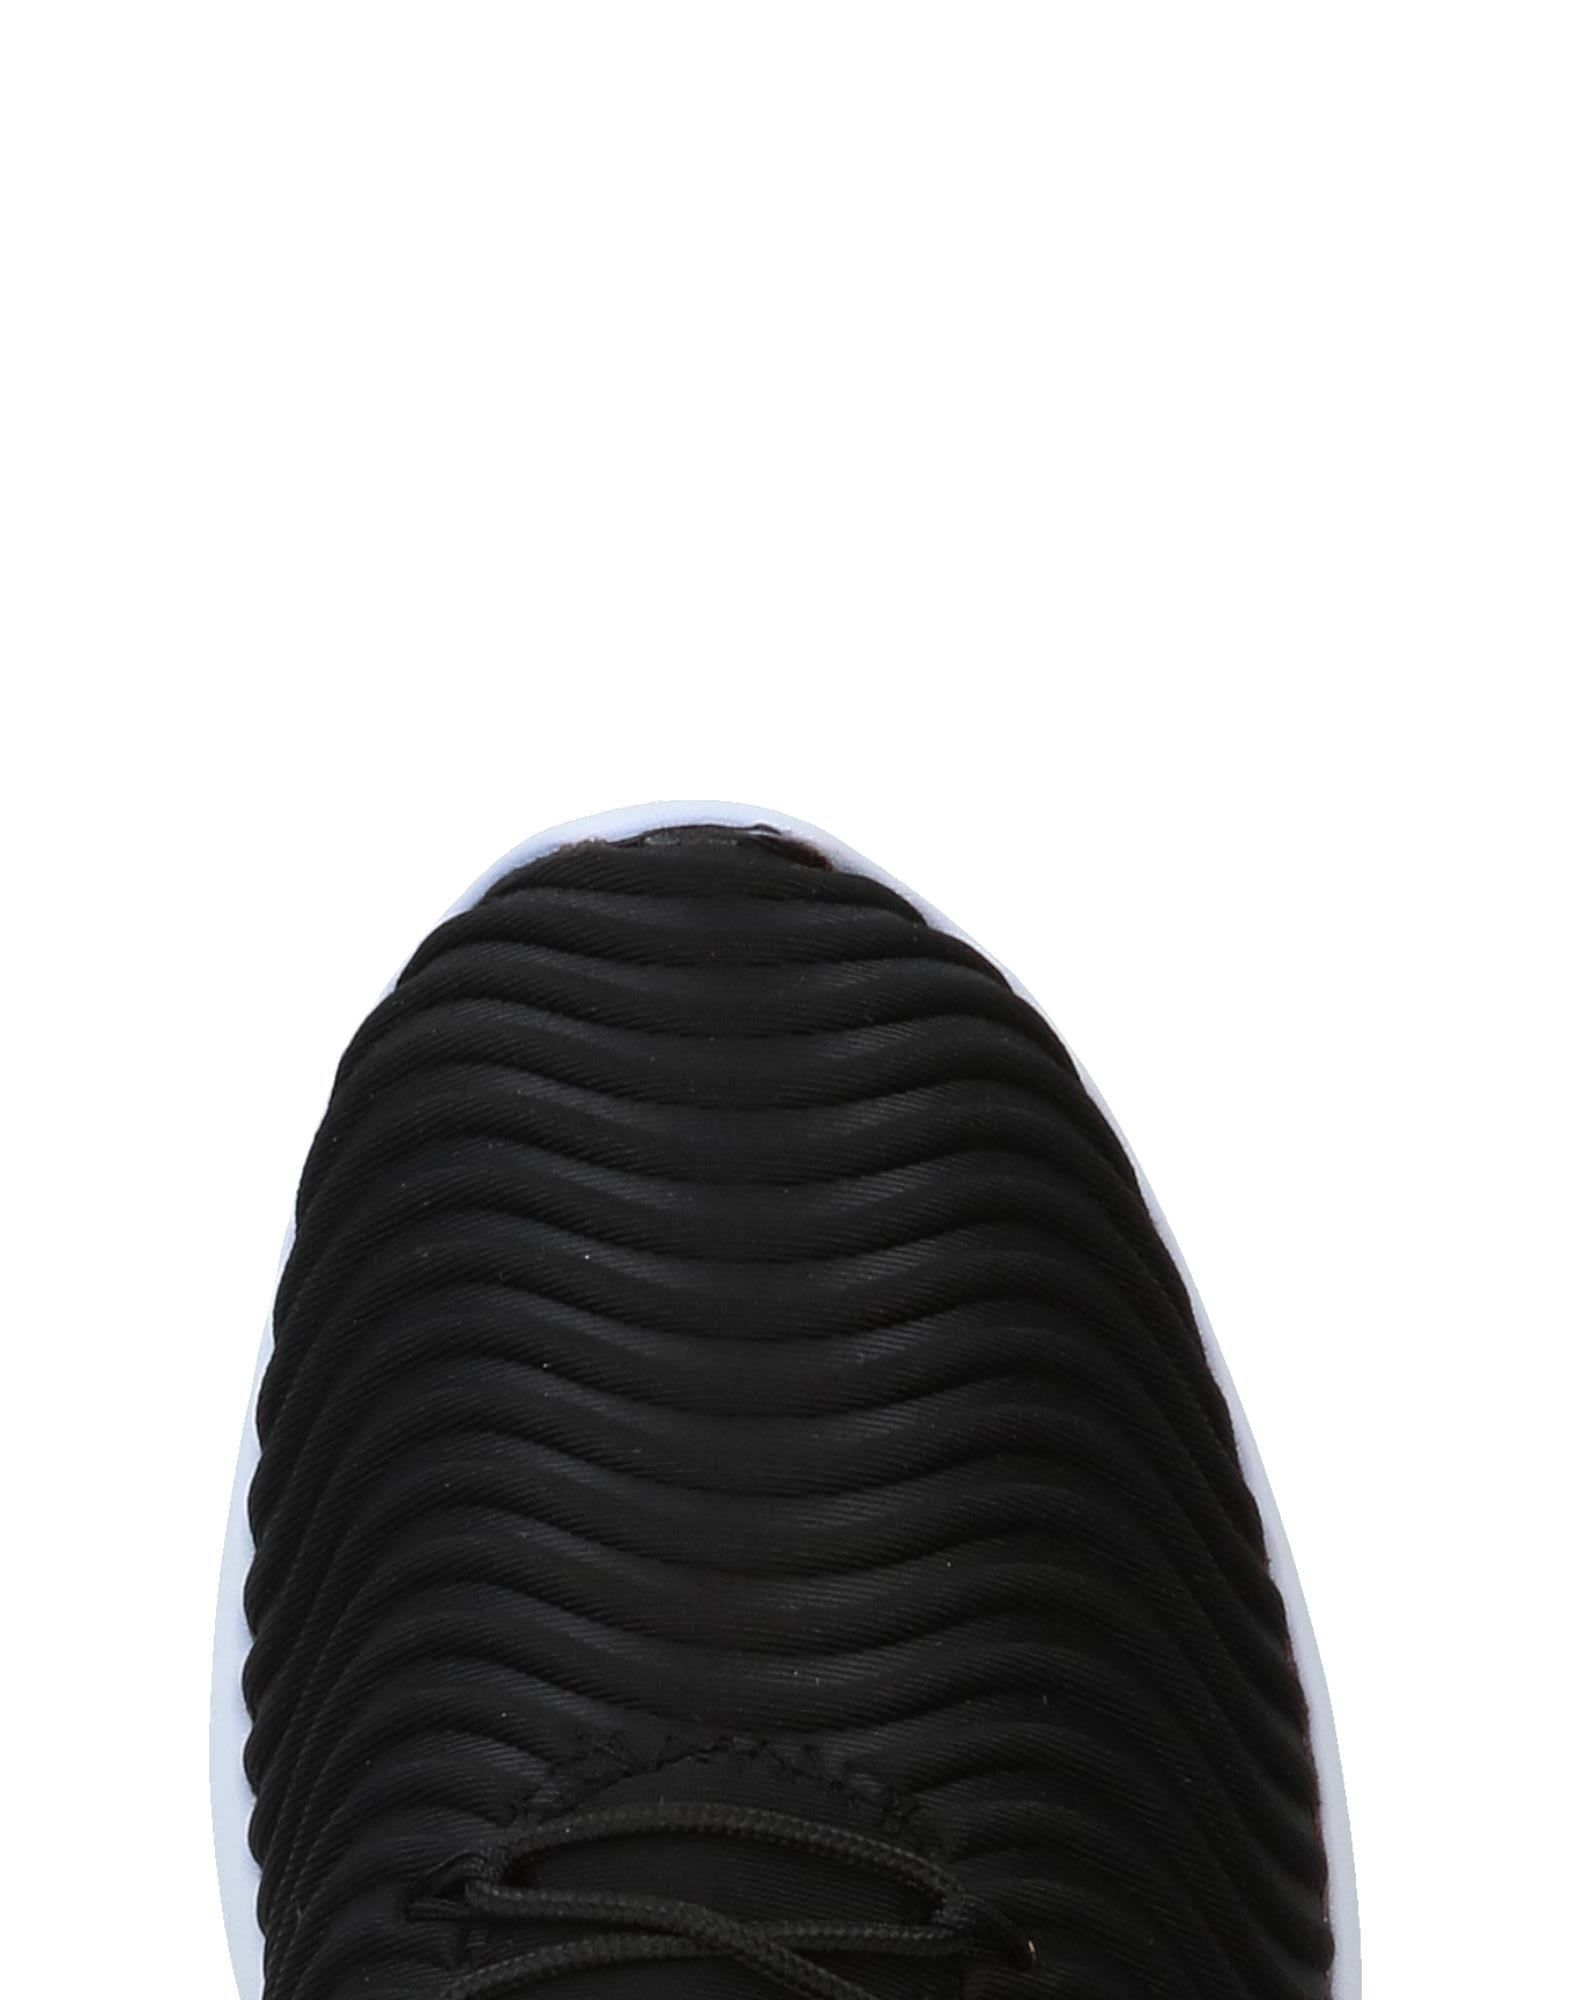 Rabatt echte  Schuhe Asfvlt Sneakers Herren  echte 11340097WR 36b339